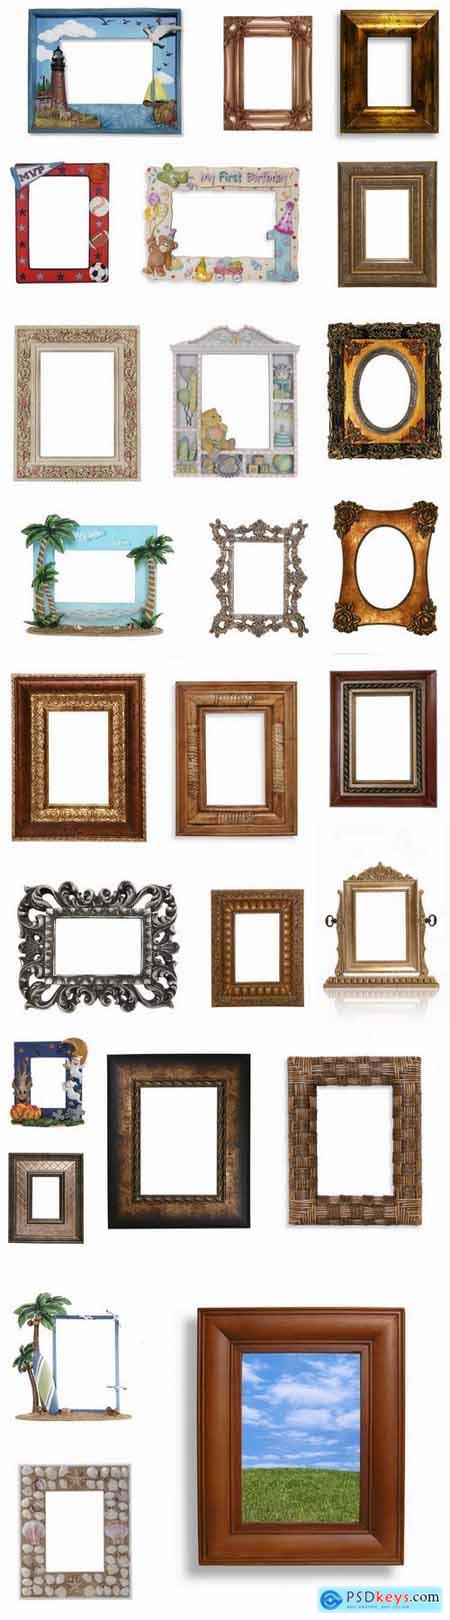 Different frame 25 HQ Jpeg